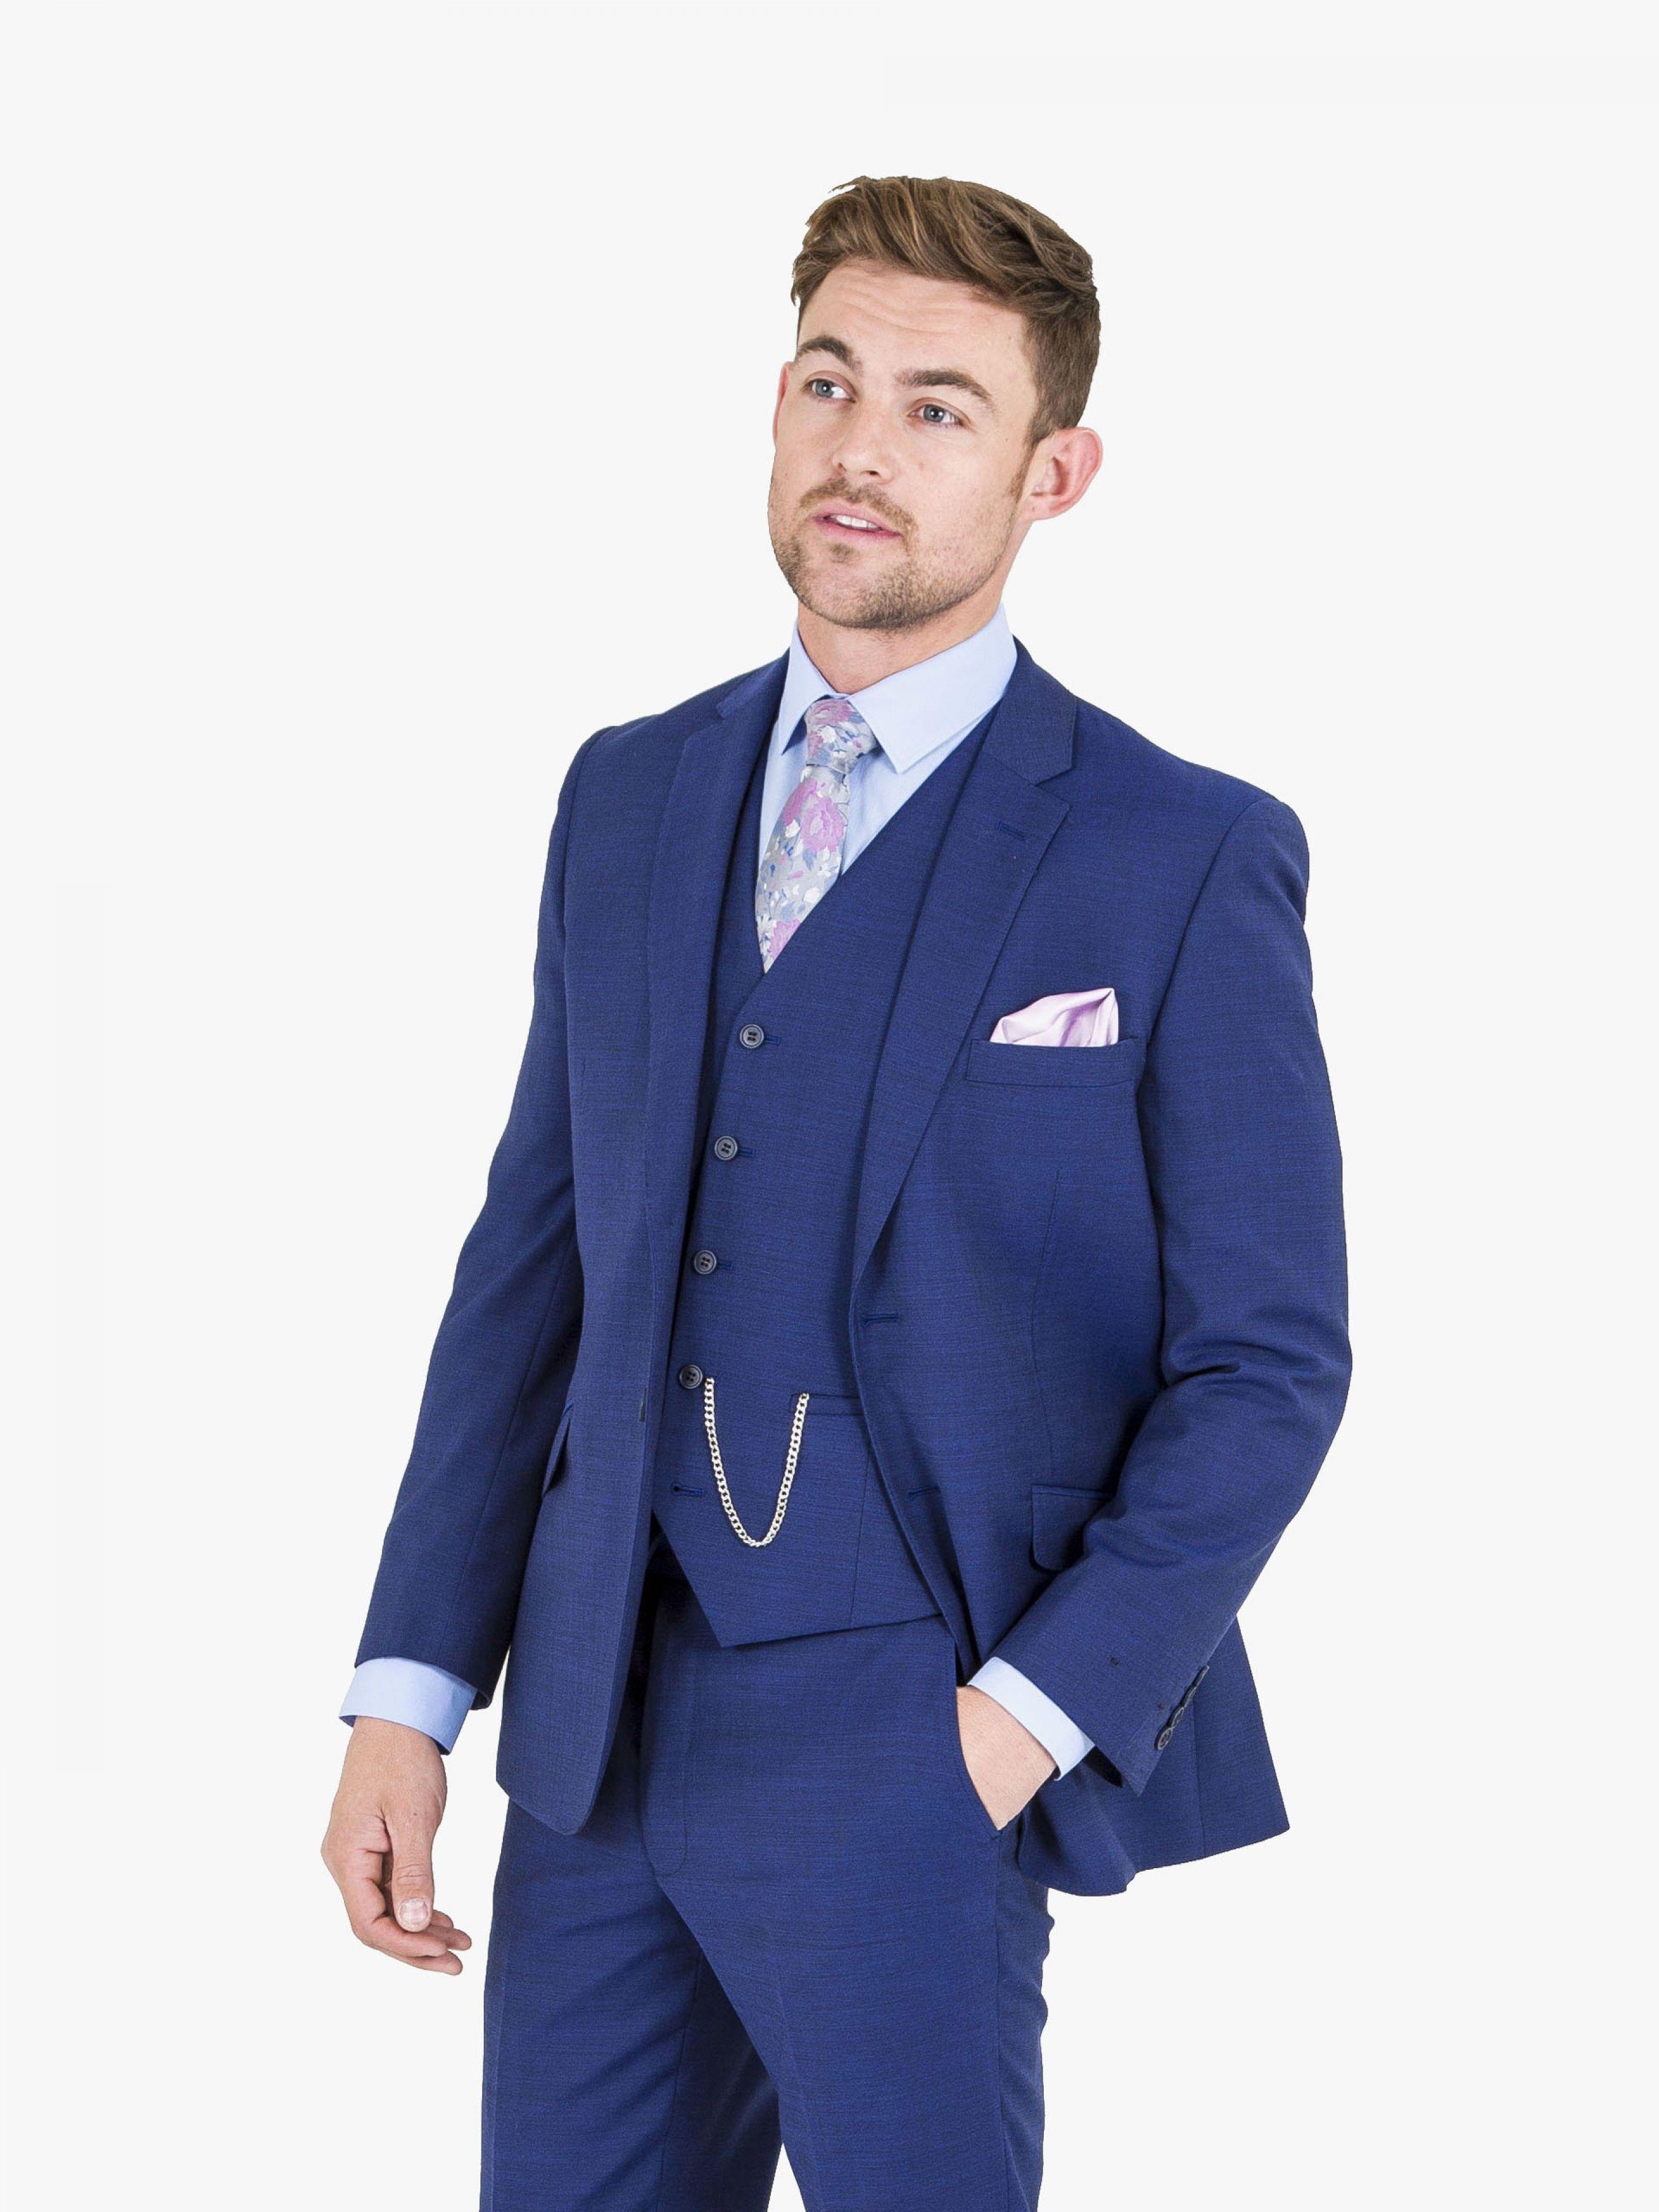 fb193149c783 Ted Baker Bright Blue Luxury Three Piece Suit